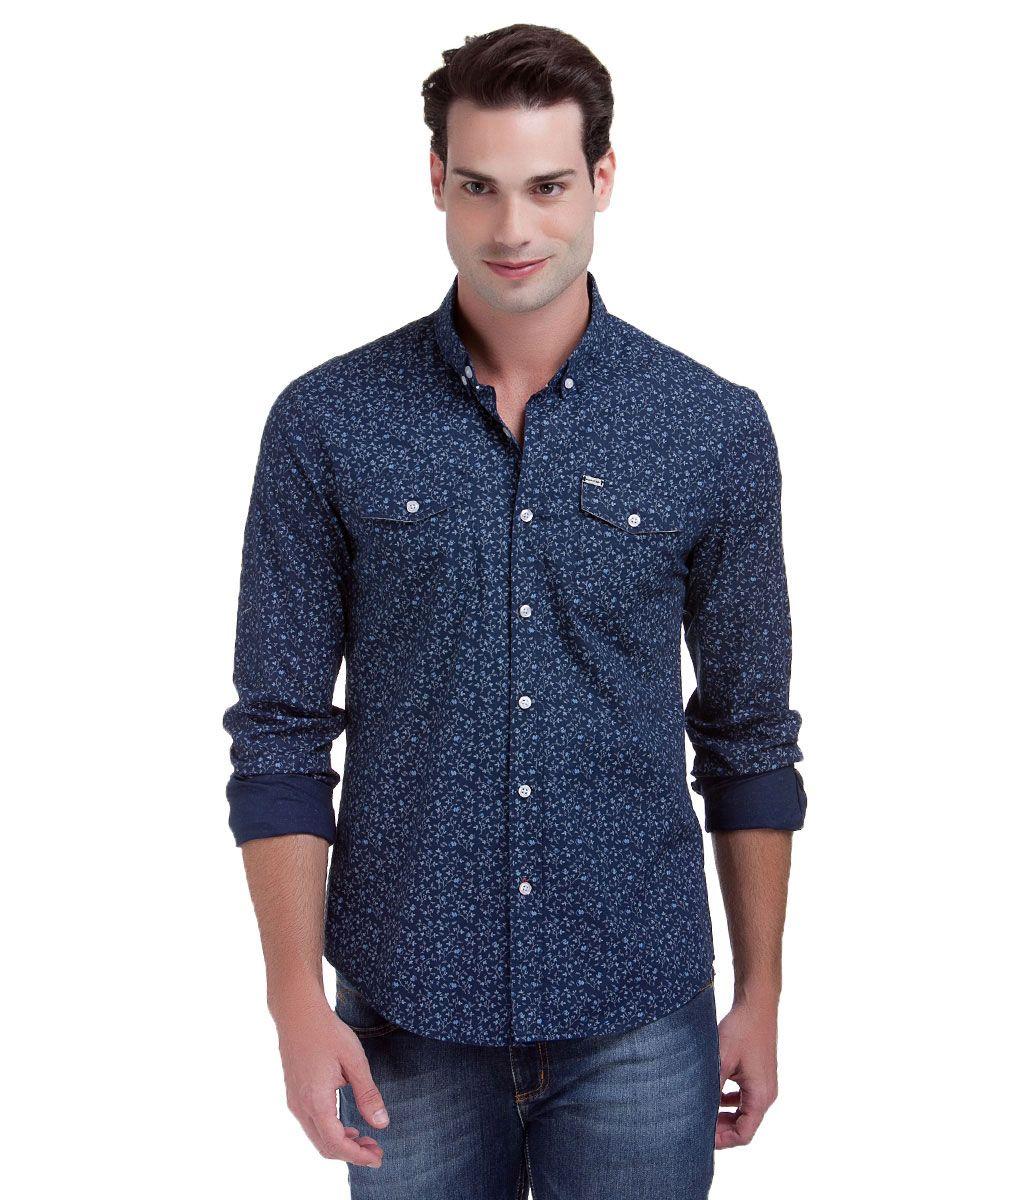 Camisa masculina manga longa estampada  53193948c88